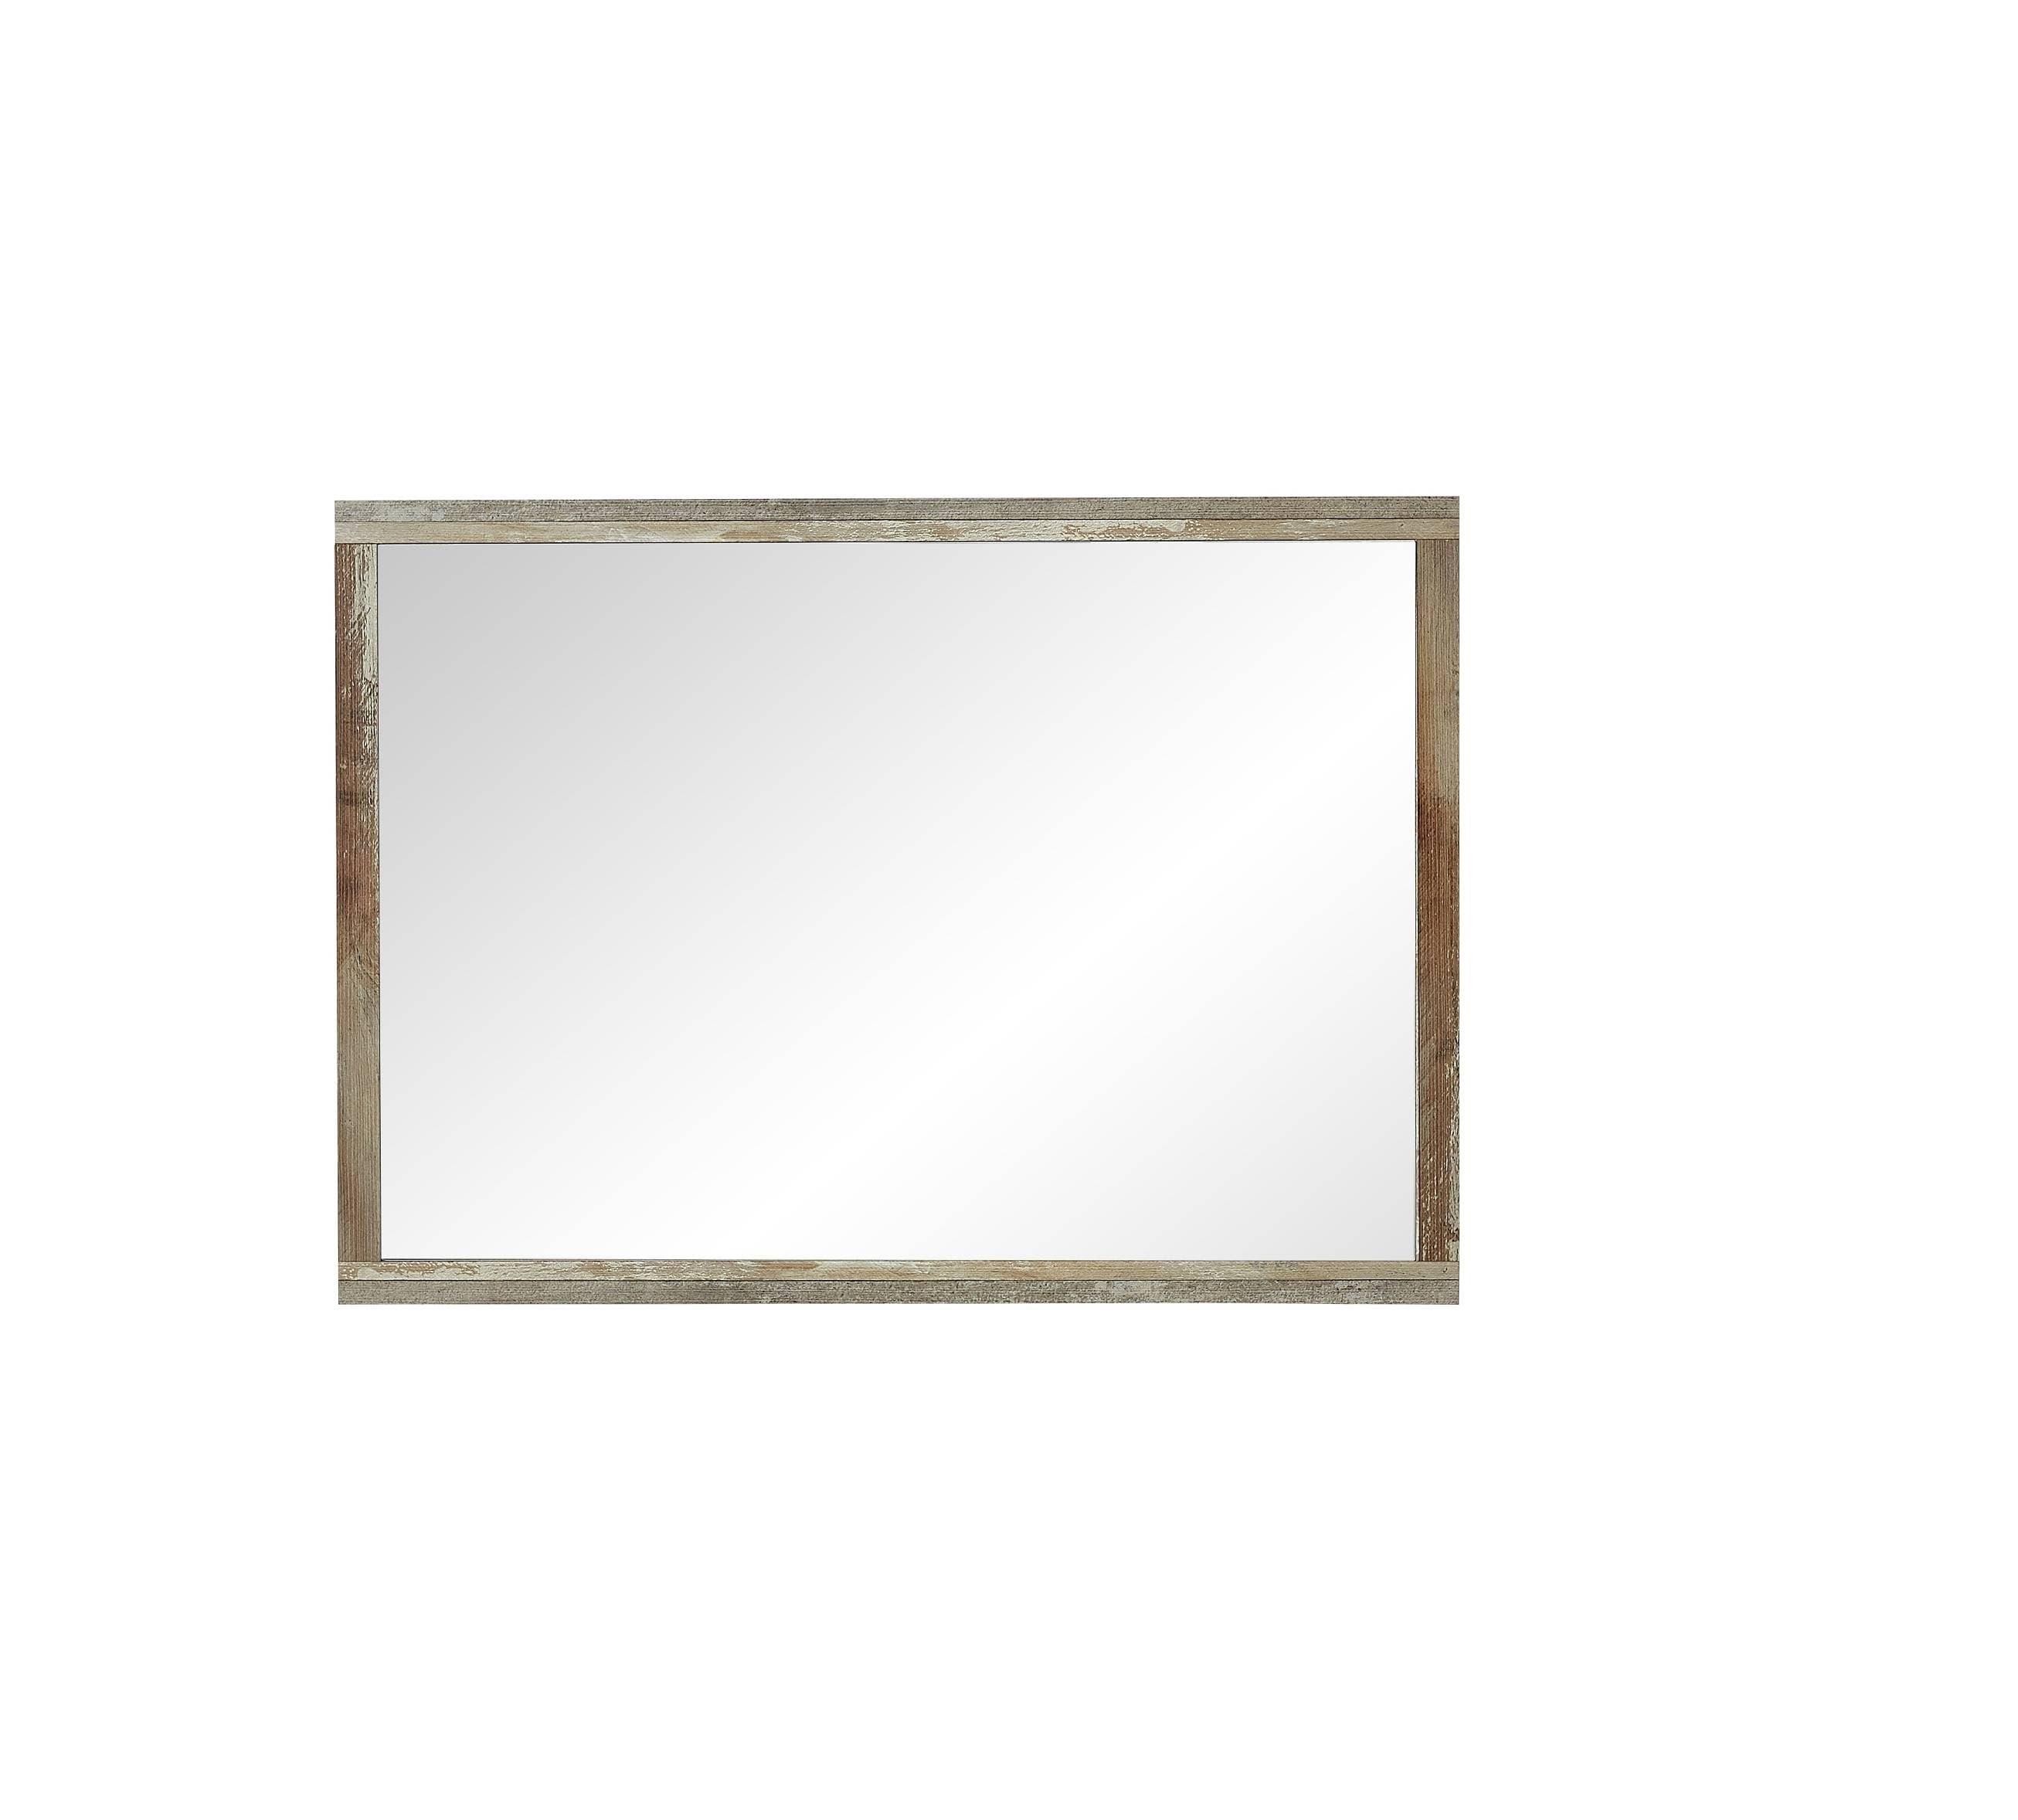 Oglinda decorativa cu rama din pal Bazna Natur / Gri inchis, l97xH70 cm somproduct.ro